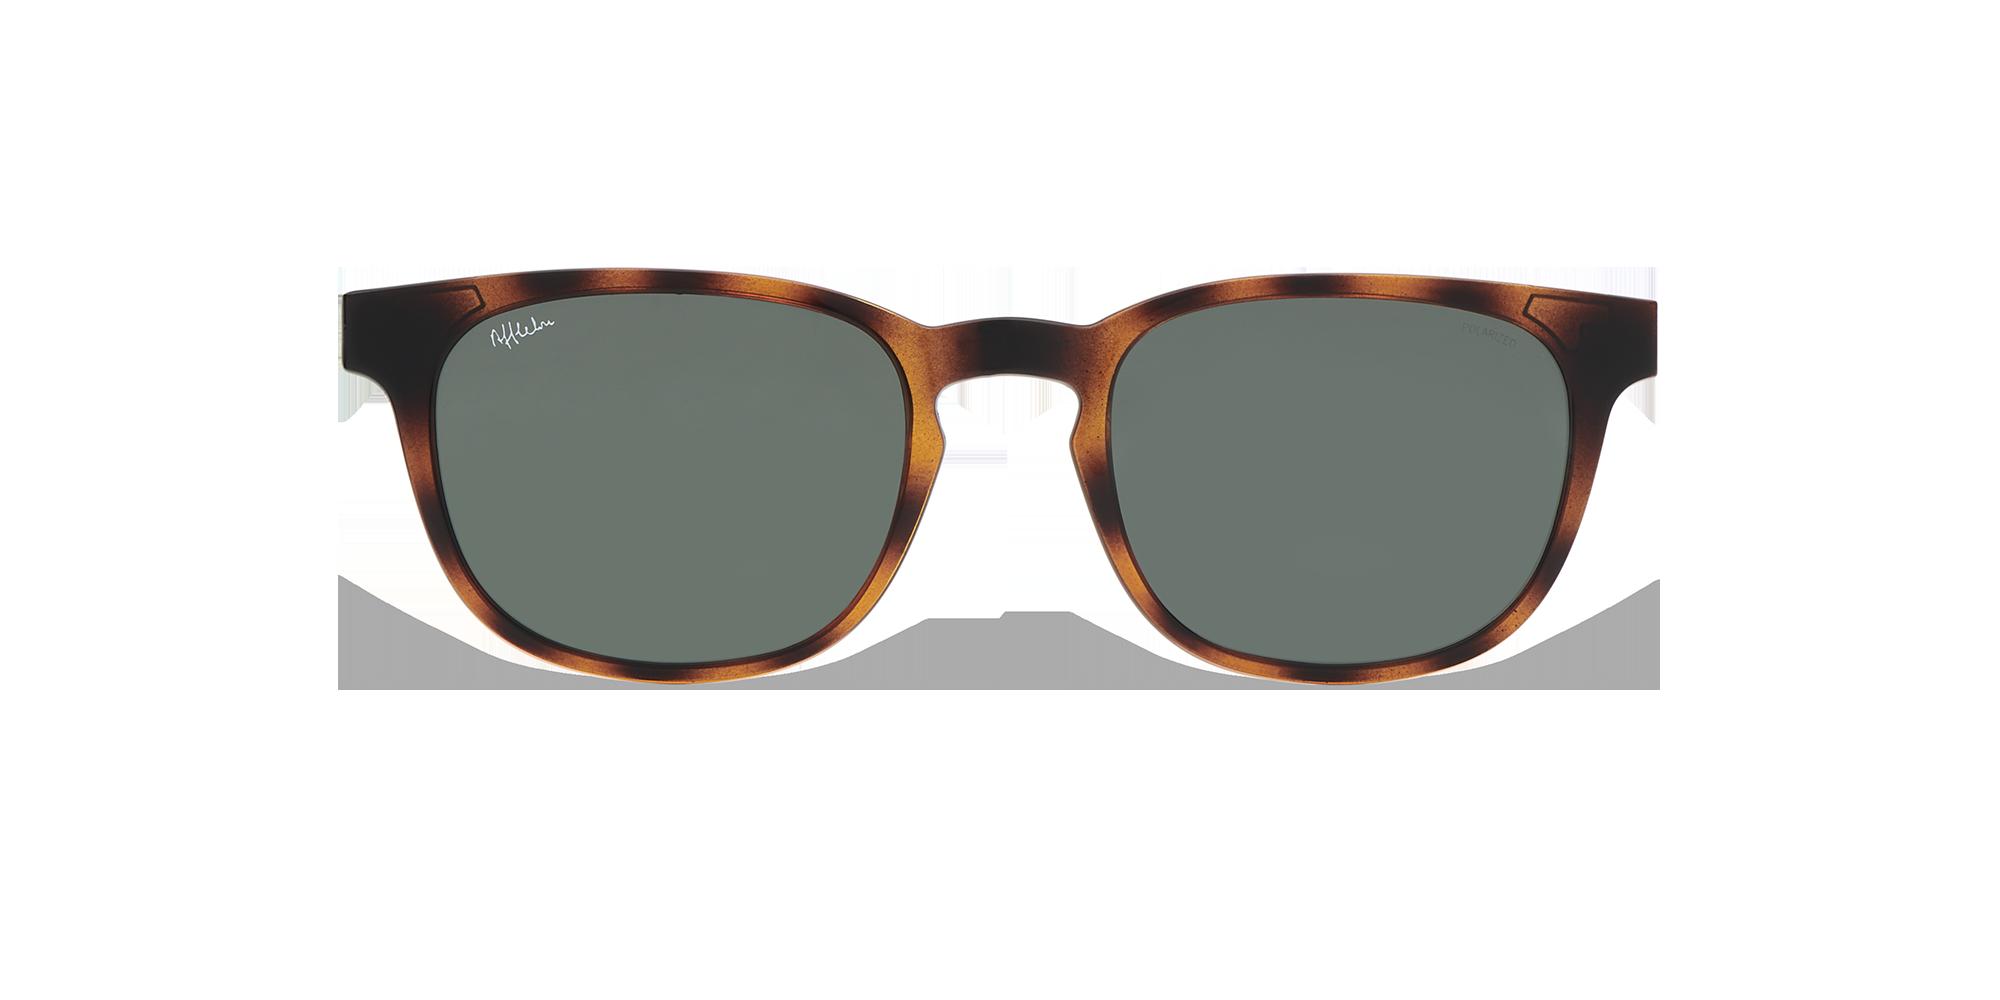 afflelou/france/products/smart_clip/clips_glasses/TMK33POTO015120.png